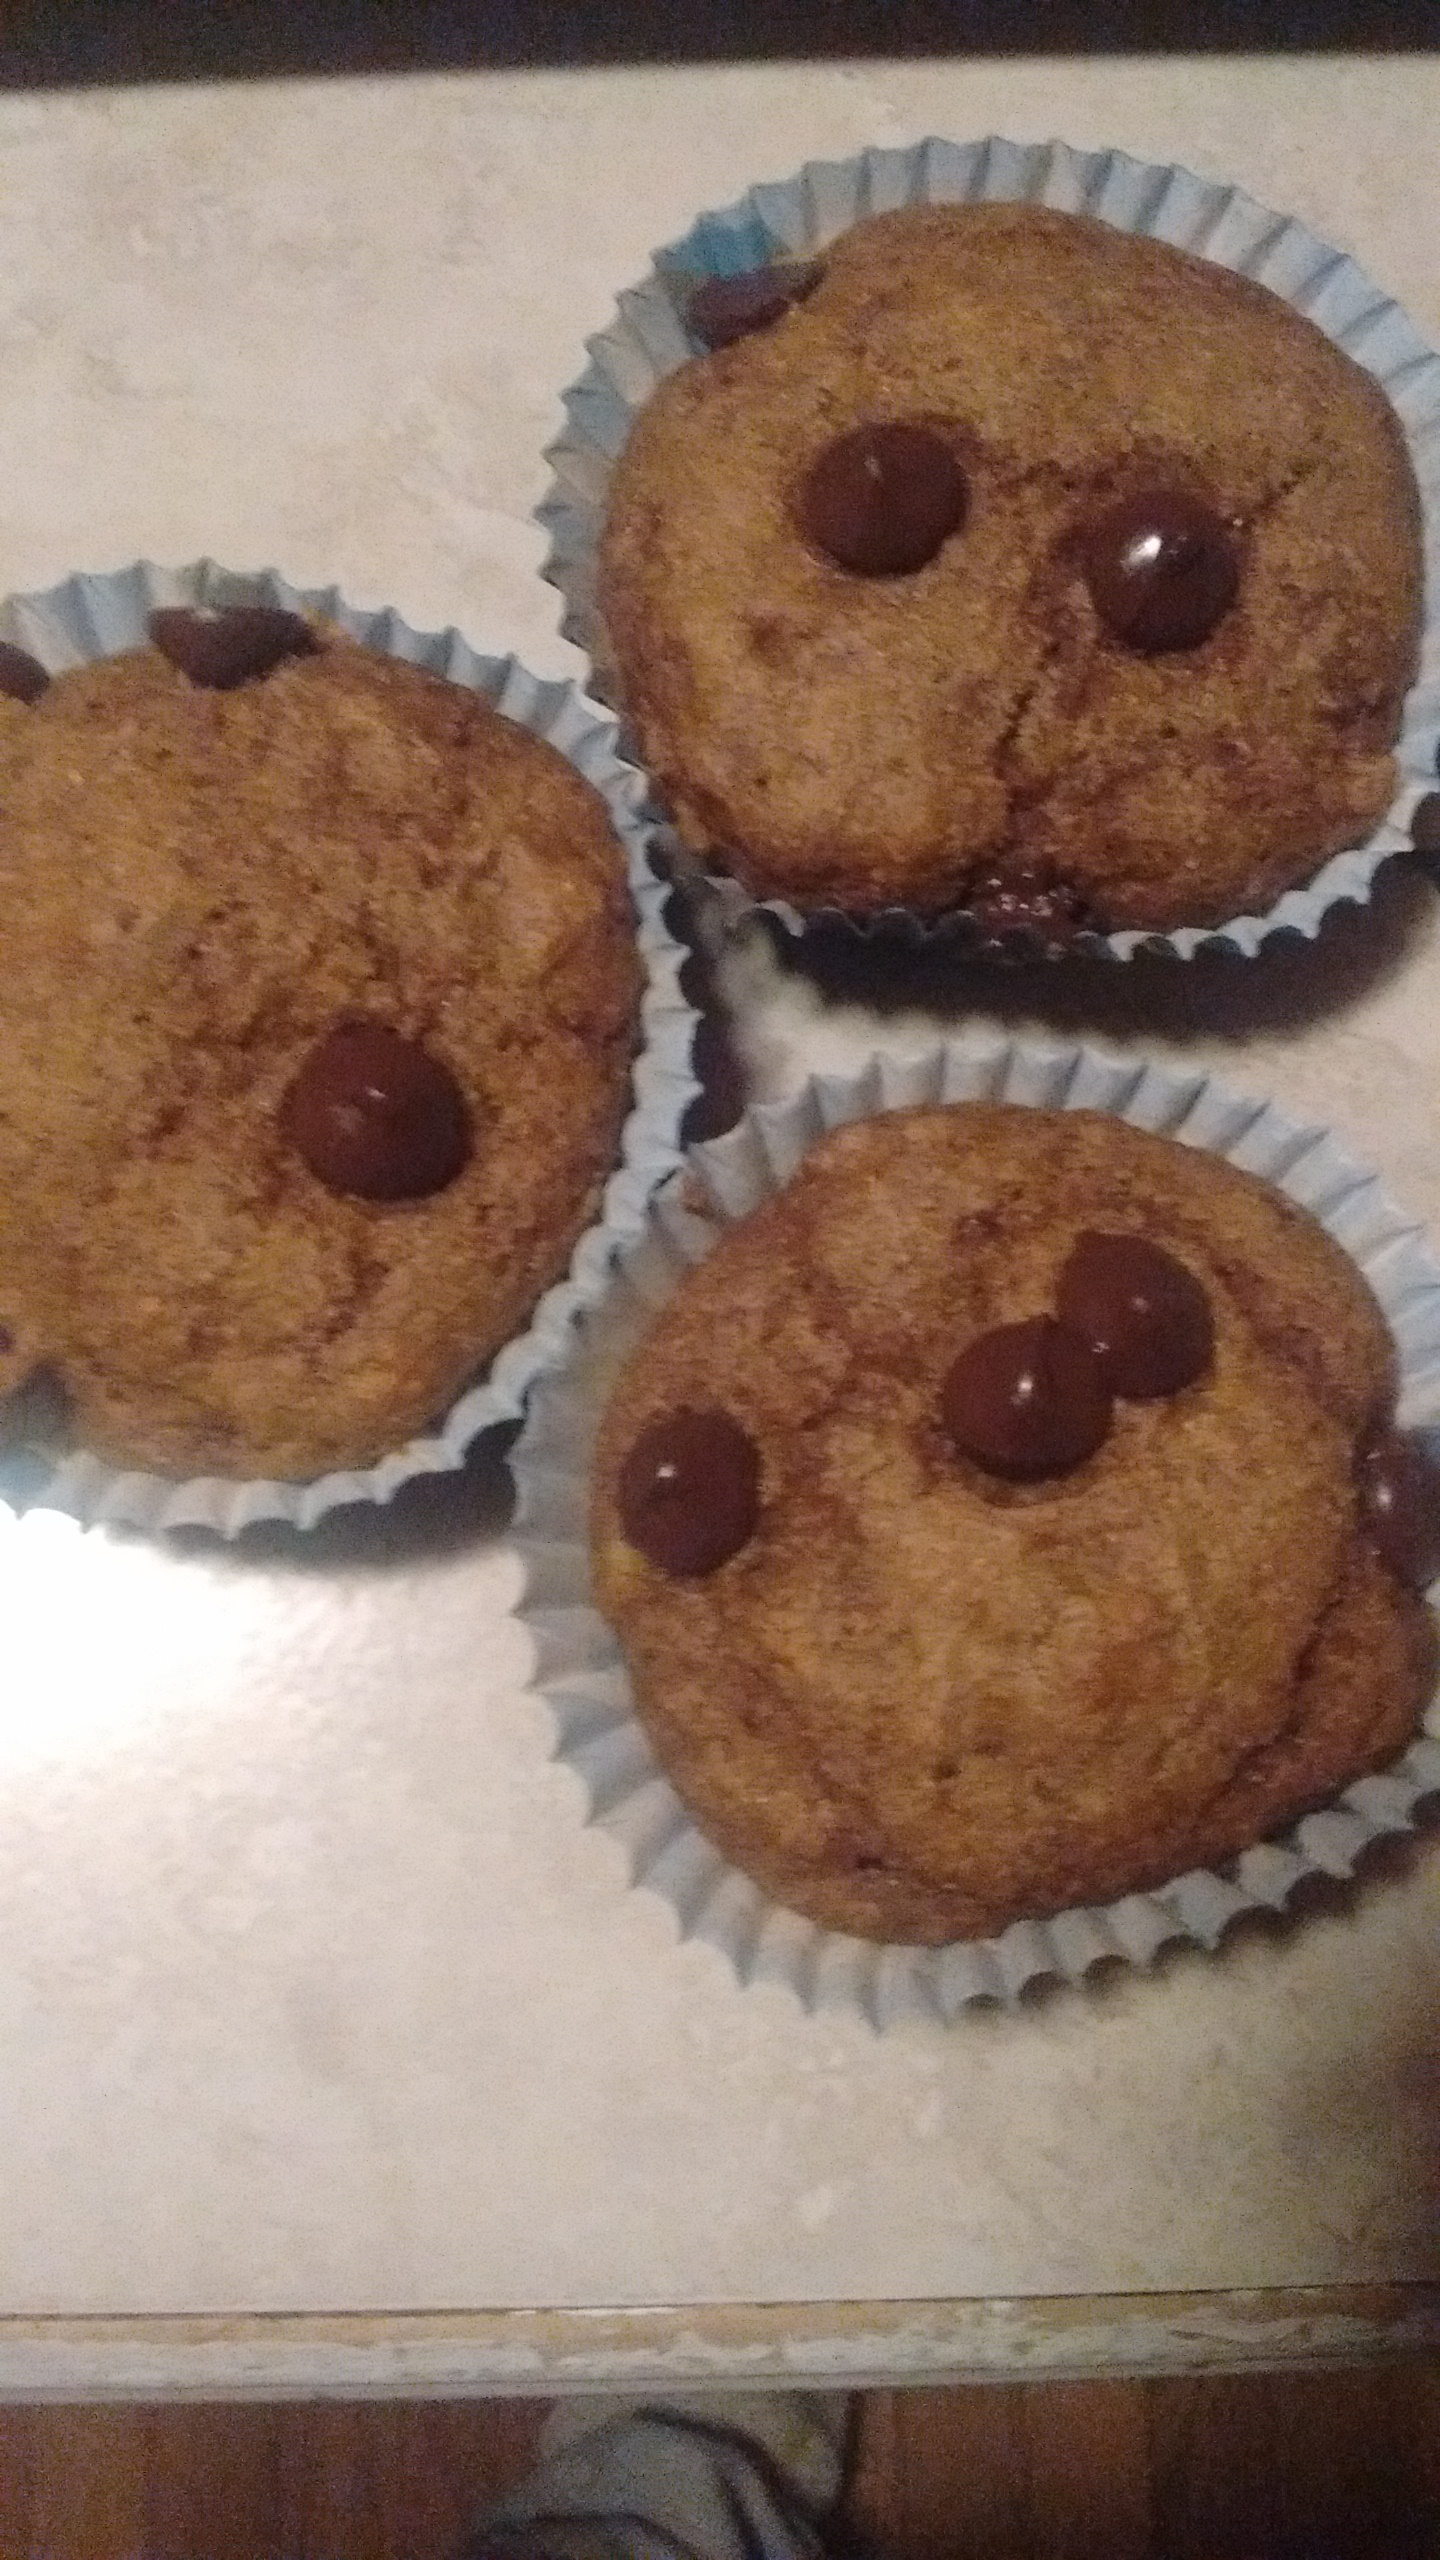 Dietetic Banana Nut Muffins Cynthia Acord Holcomb